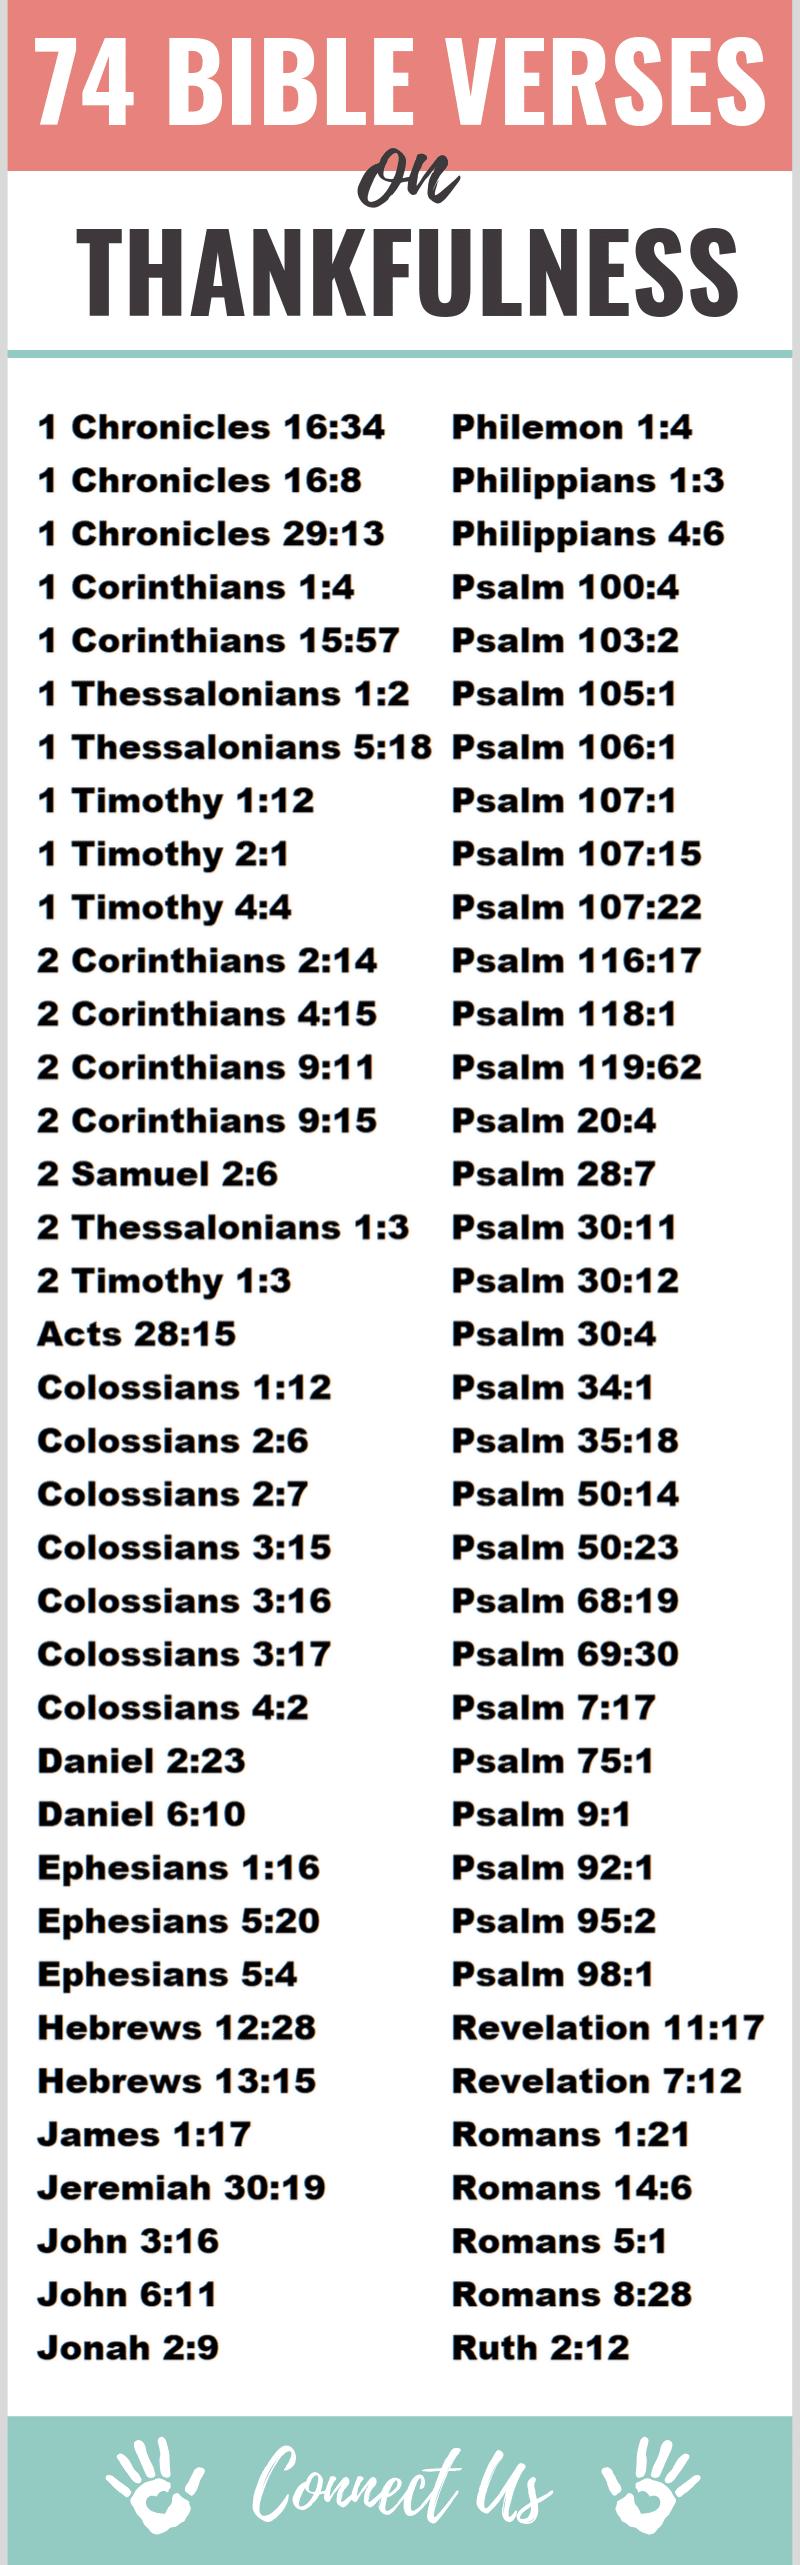 Bible Verses on Thankfulness